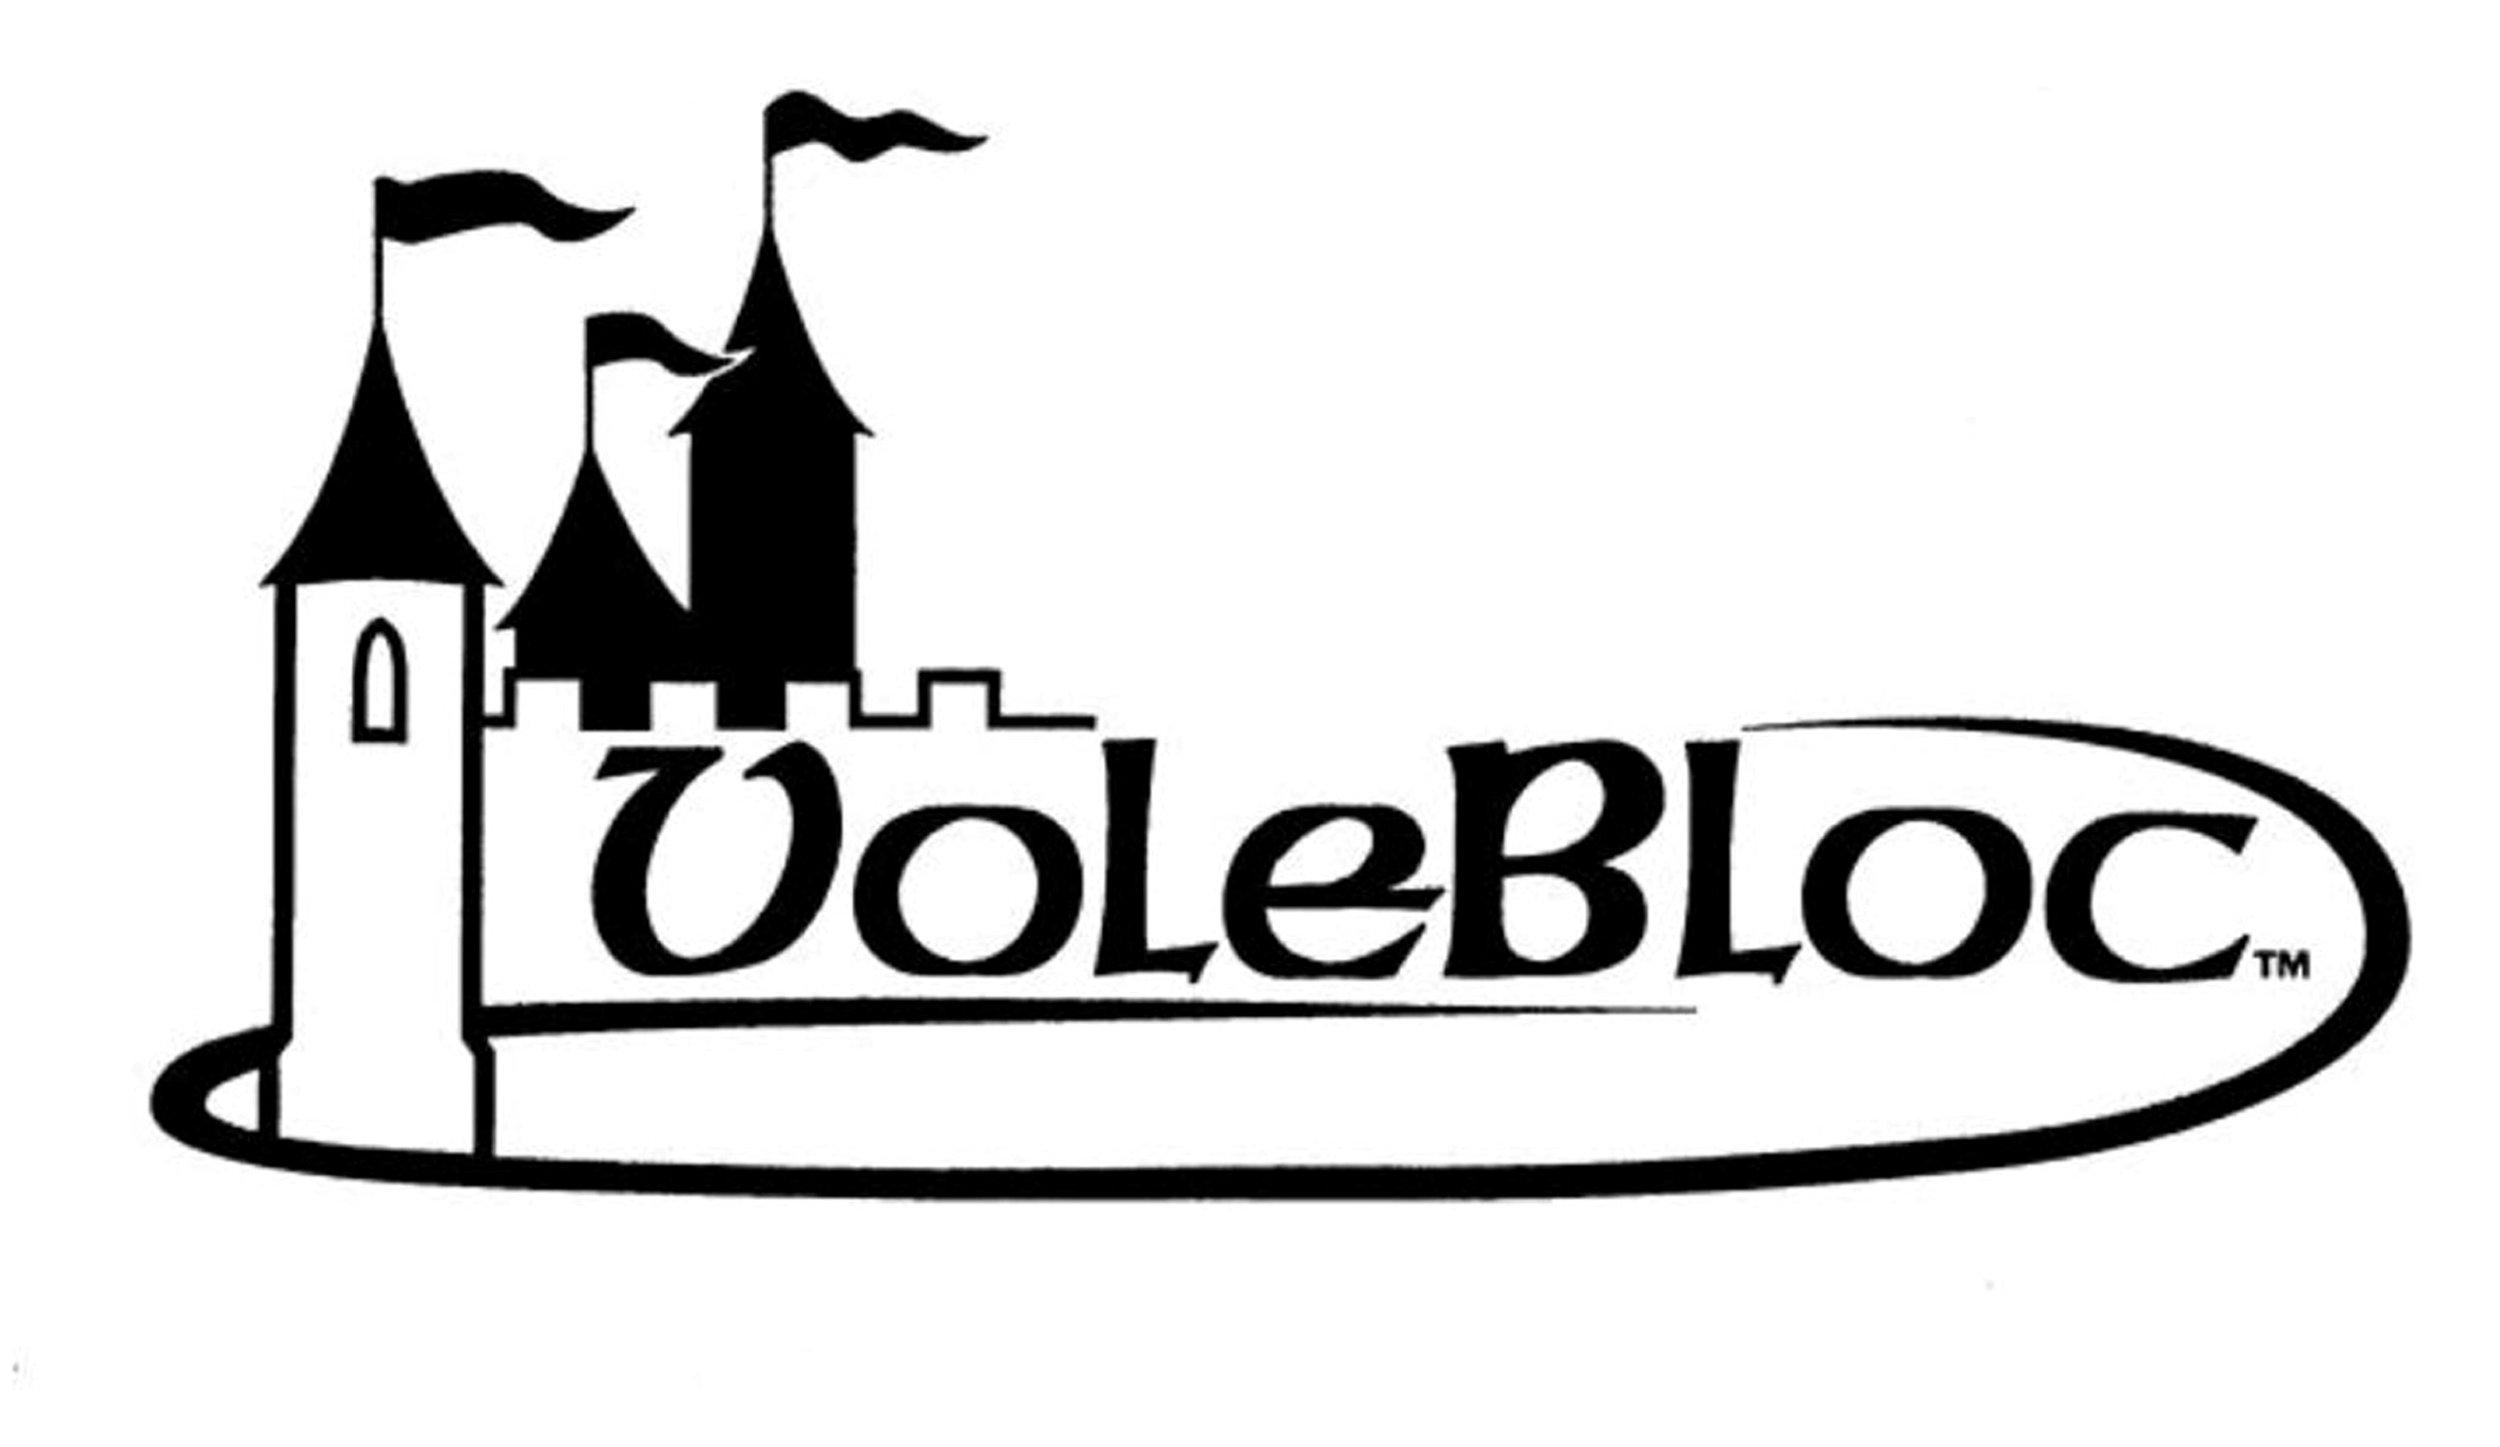 VoleBloc logo B&W.jpg